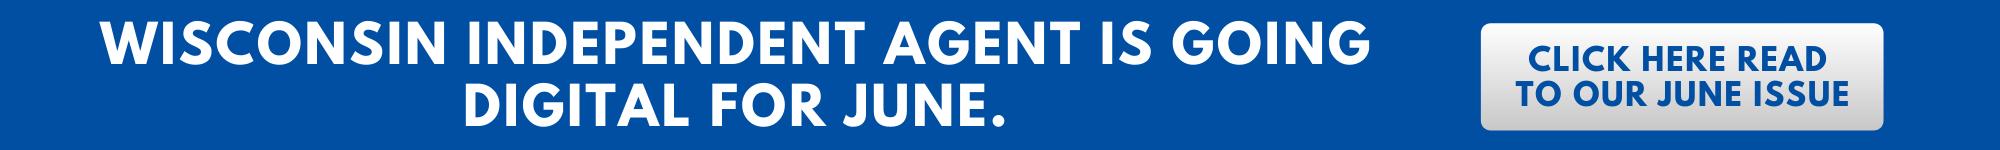 Wisconsin Independent Agent Magazine - June Edition